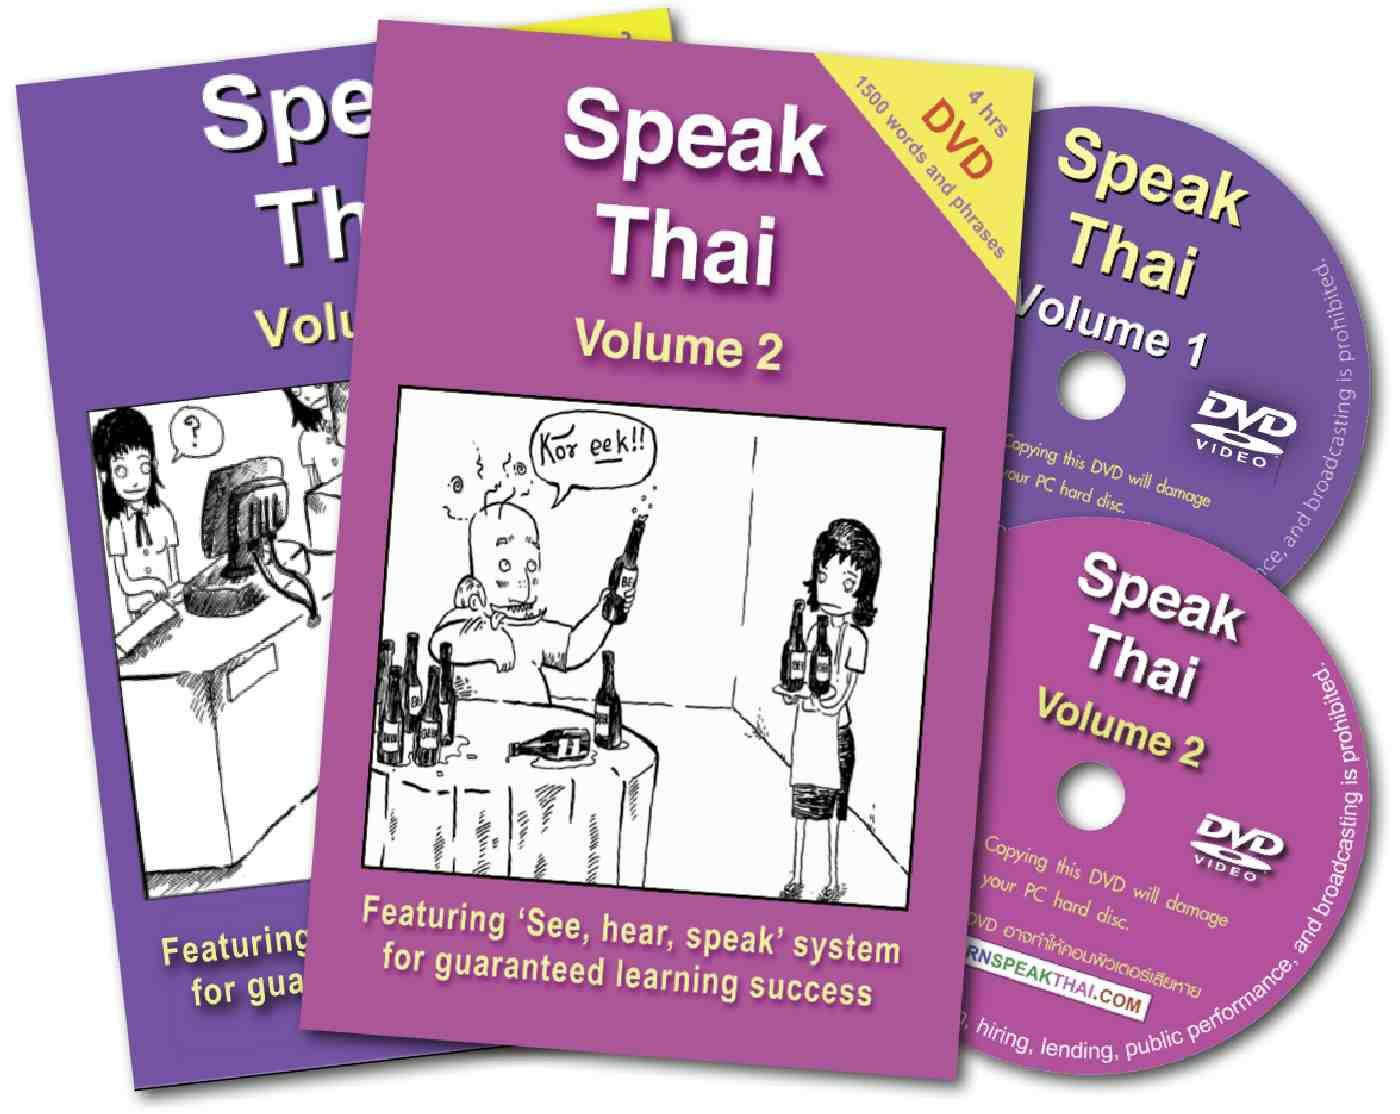 The Complete Speak Thai Volume 1 and 2